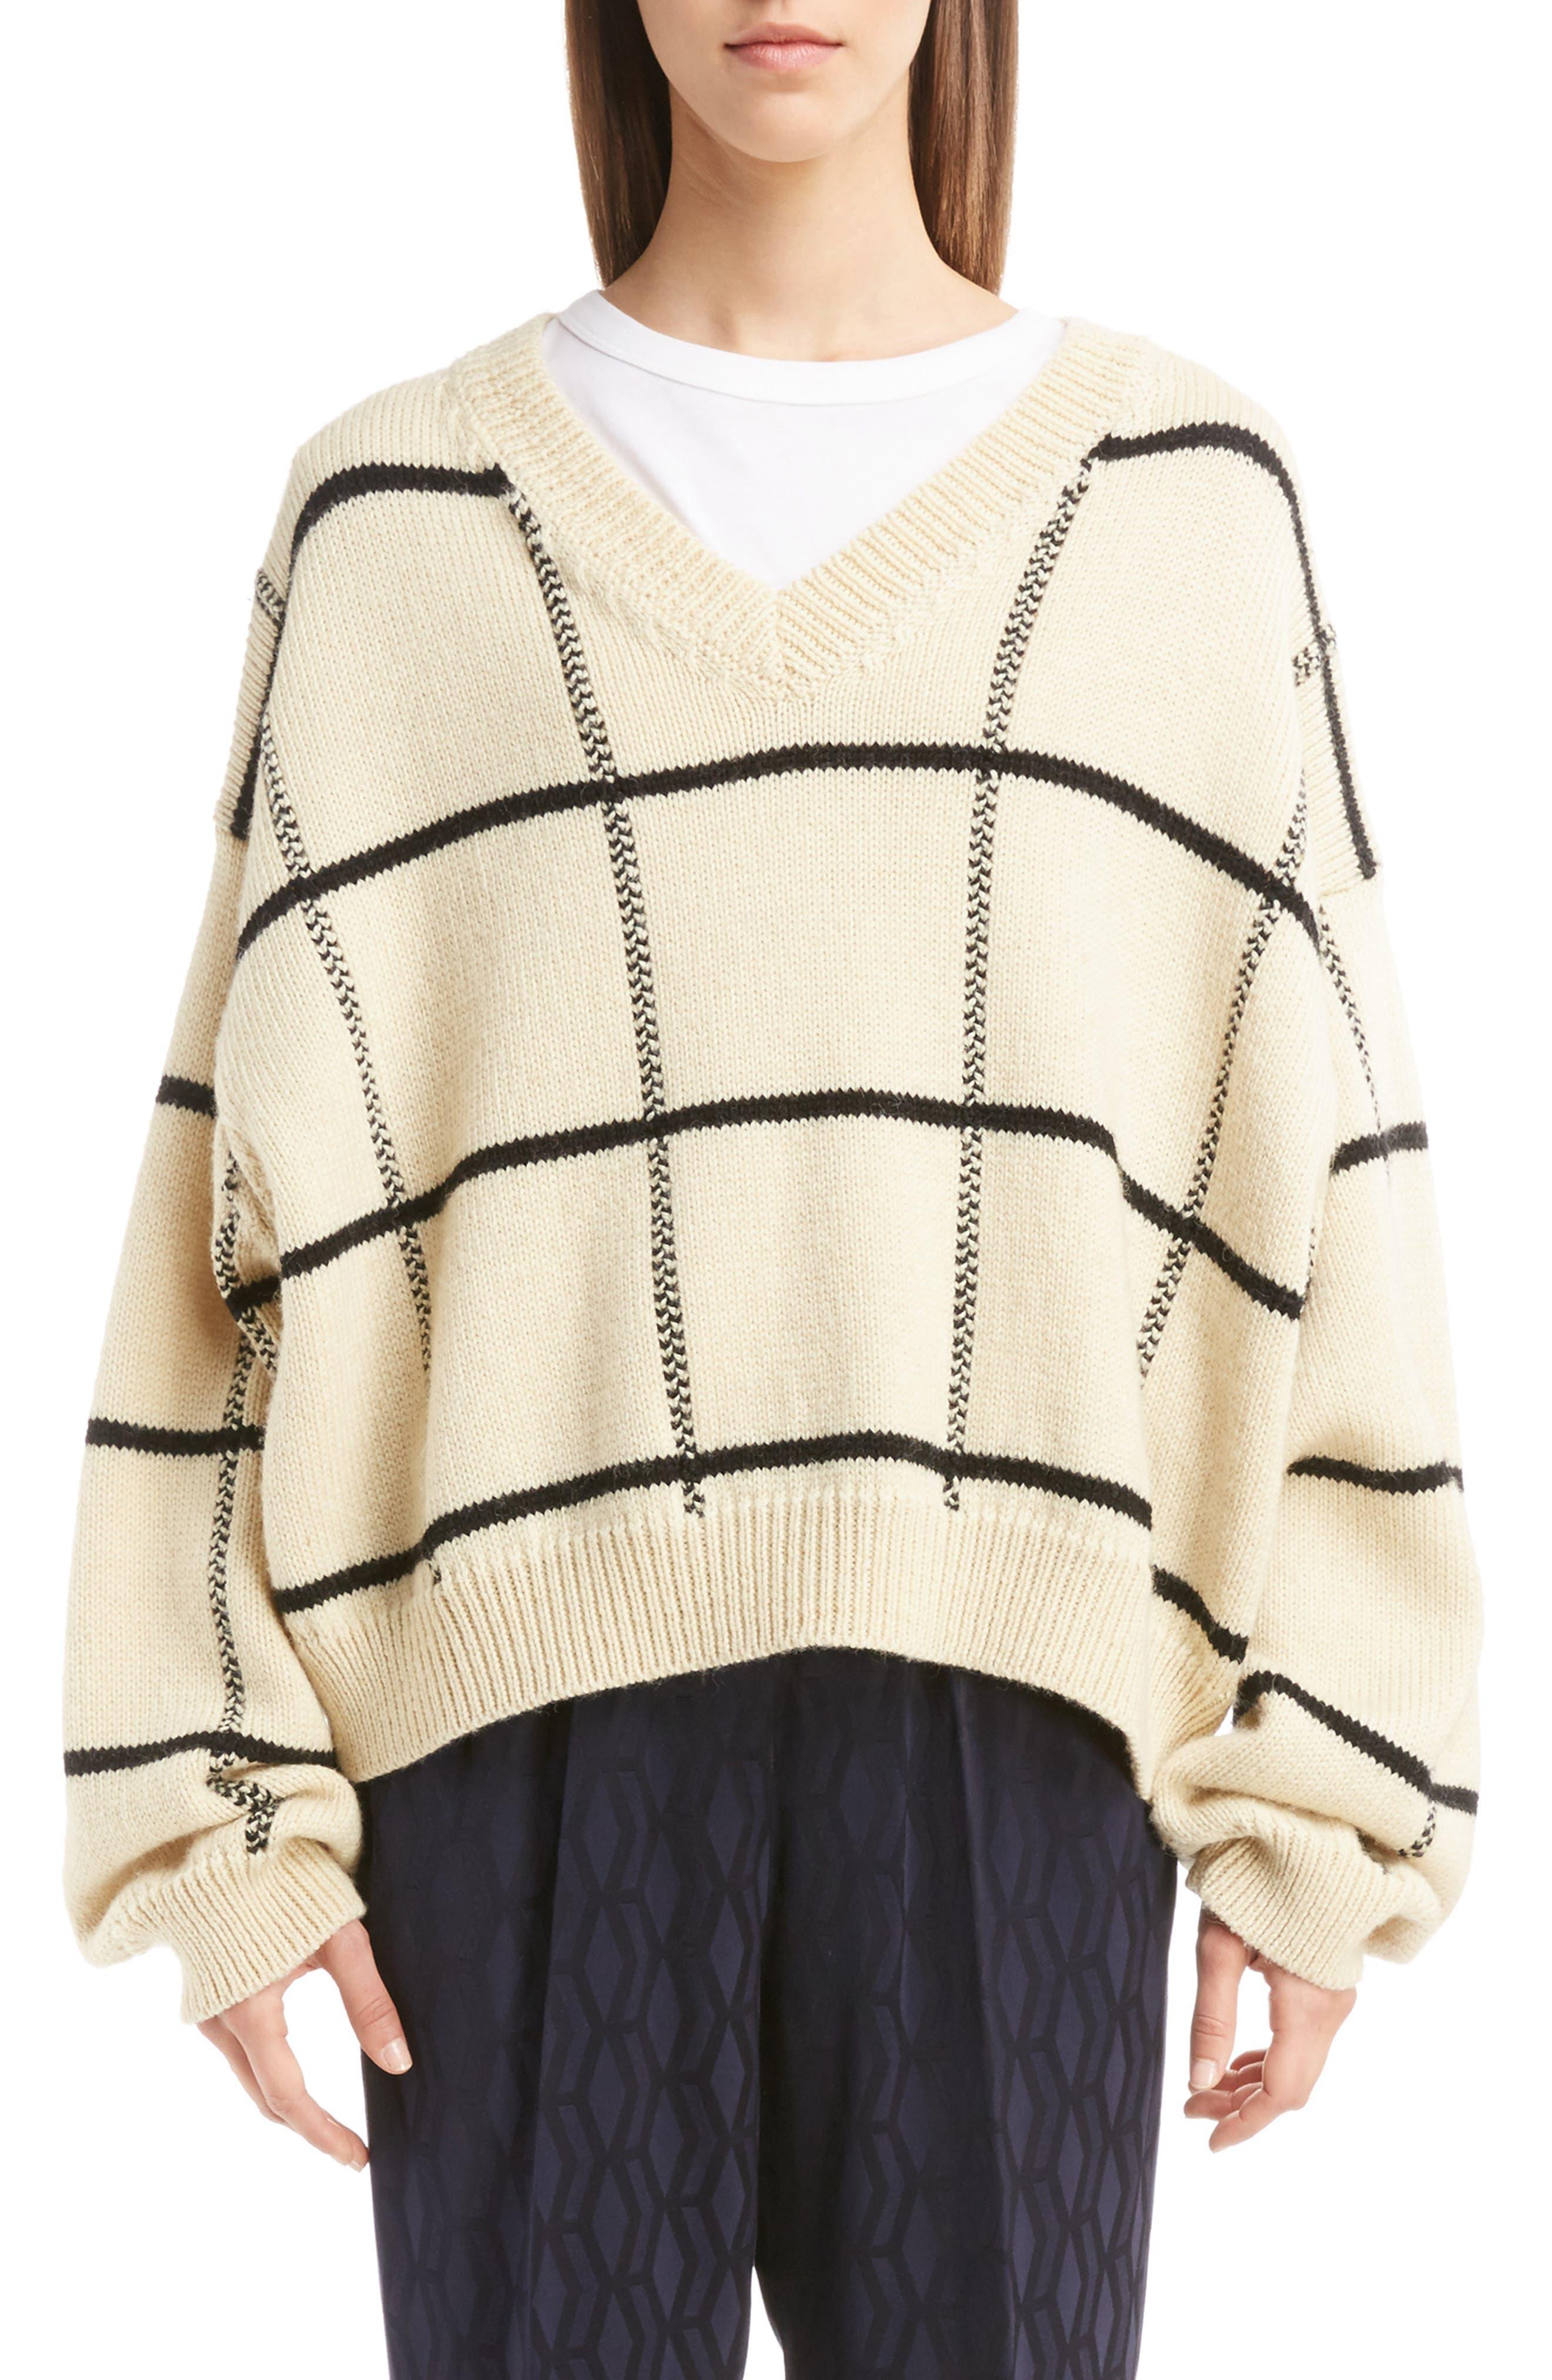 Alternate Image 1 Selected - Dries Van Noten Windowpane Knit Wool Sweater